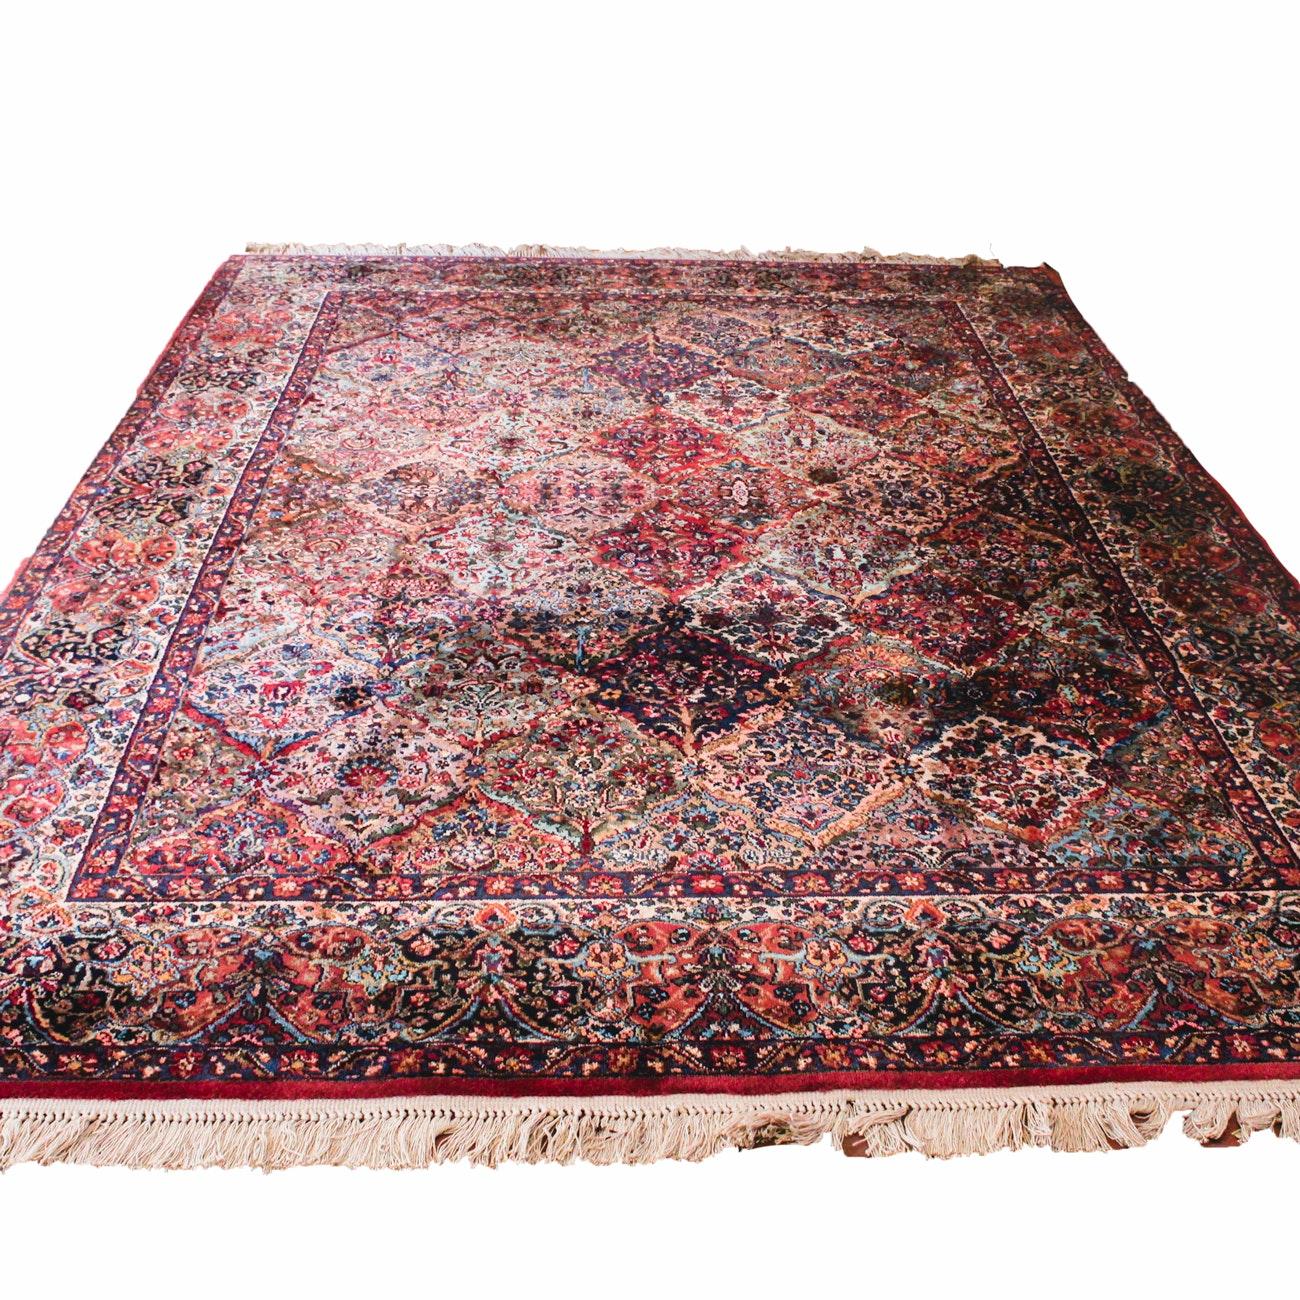 Large Machine-Made Wool Area Rug by Karastan